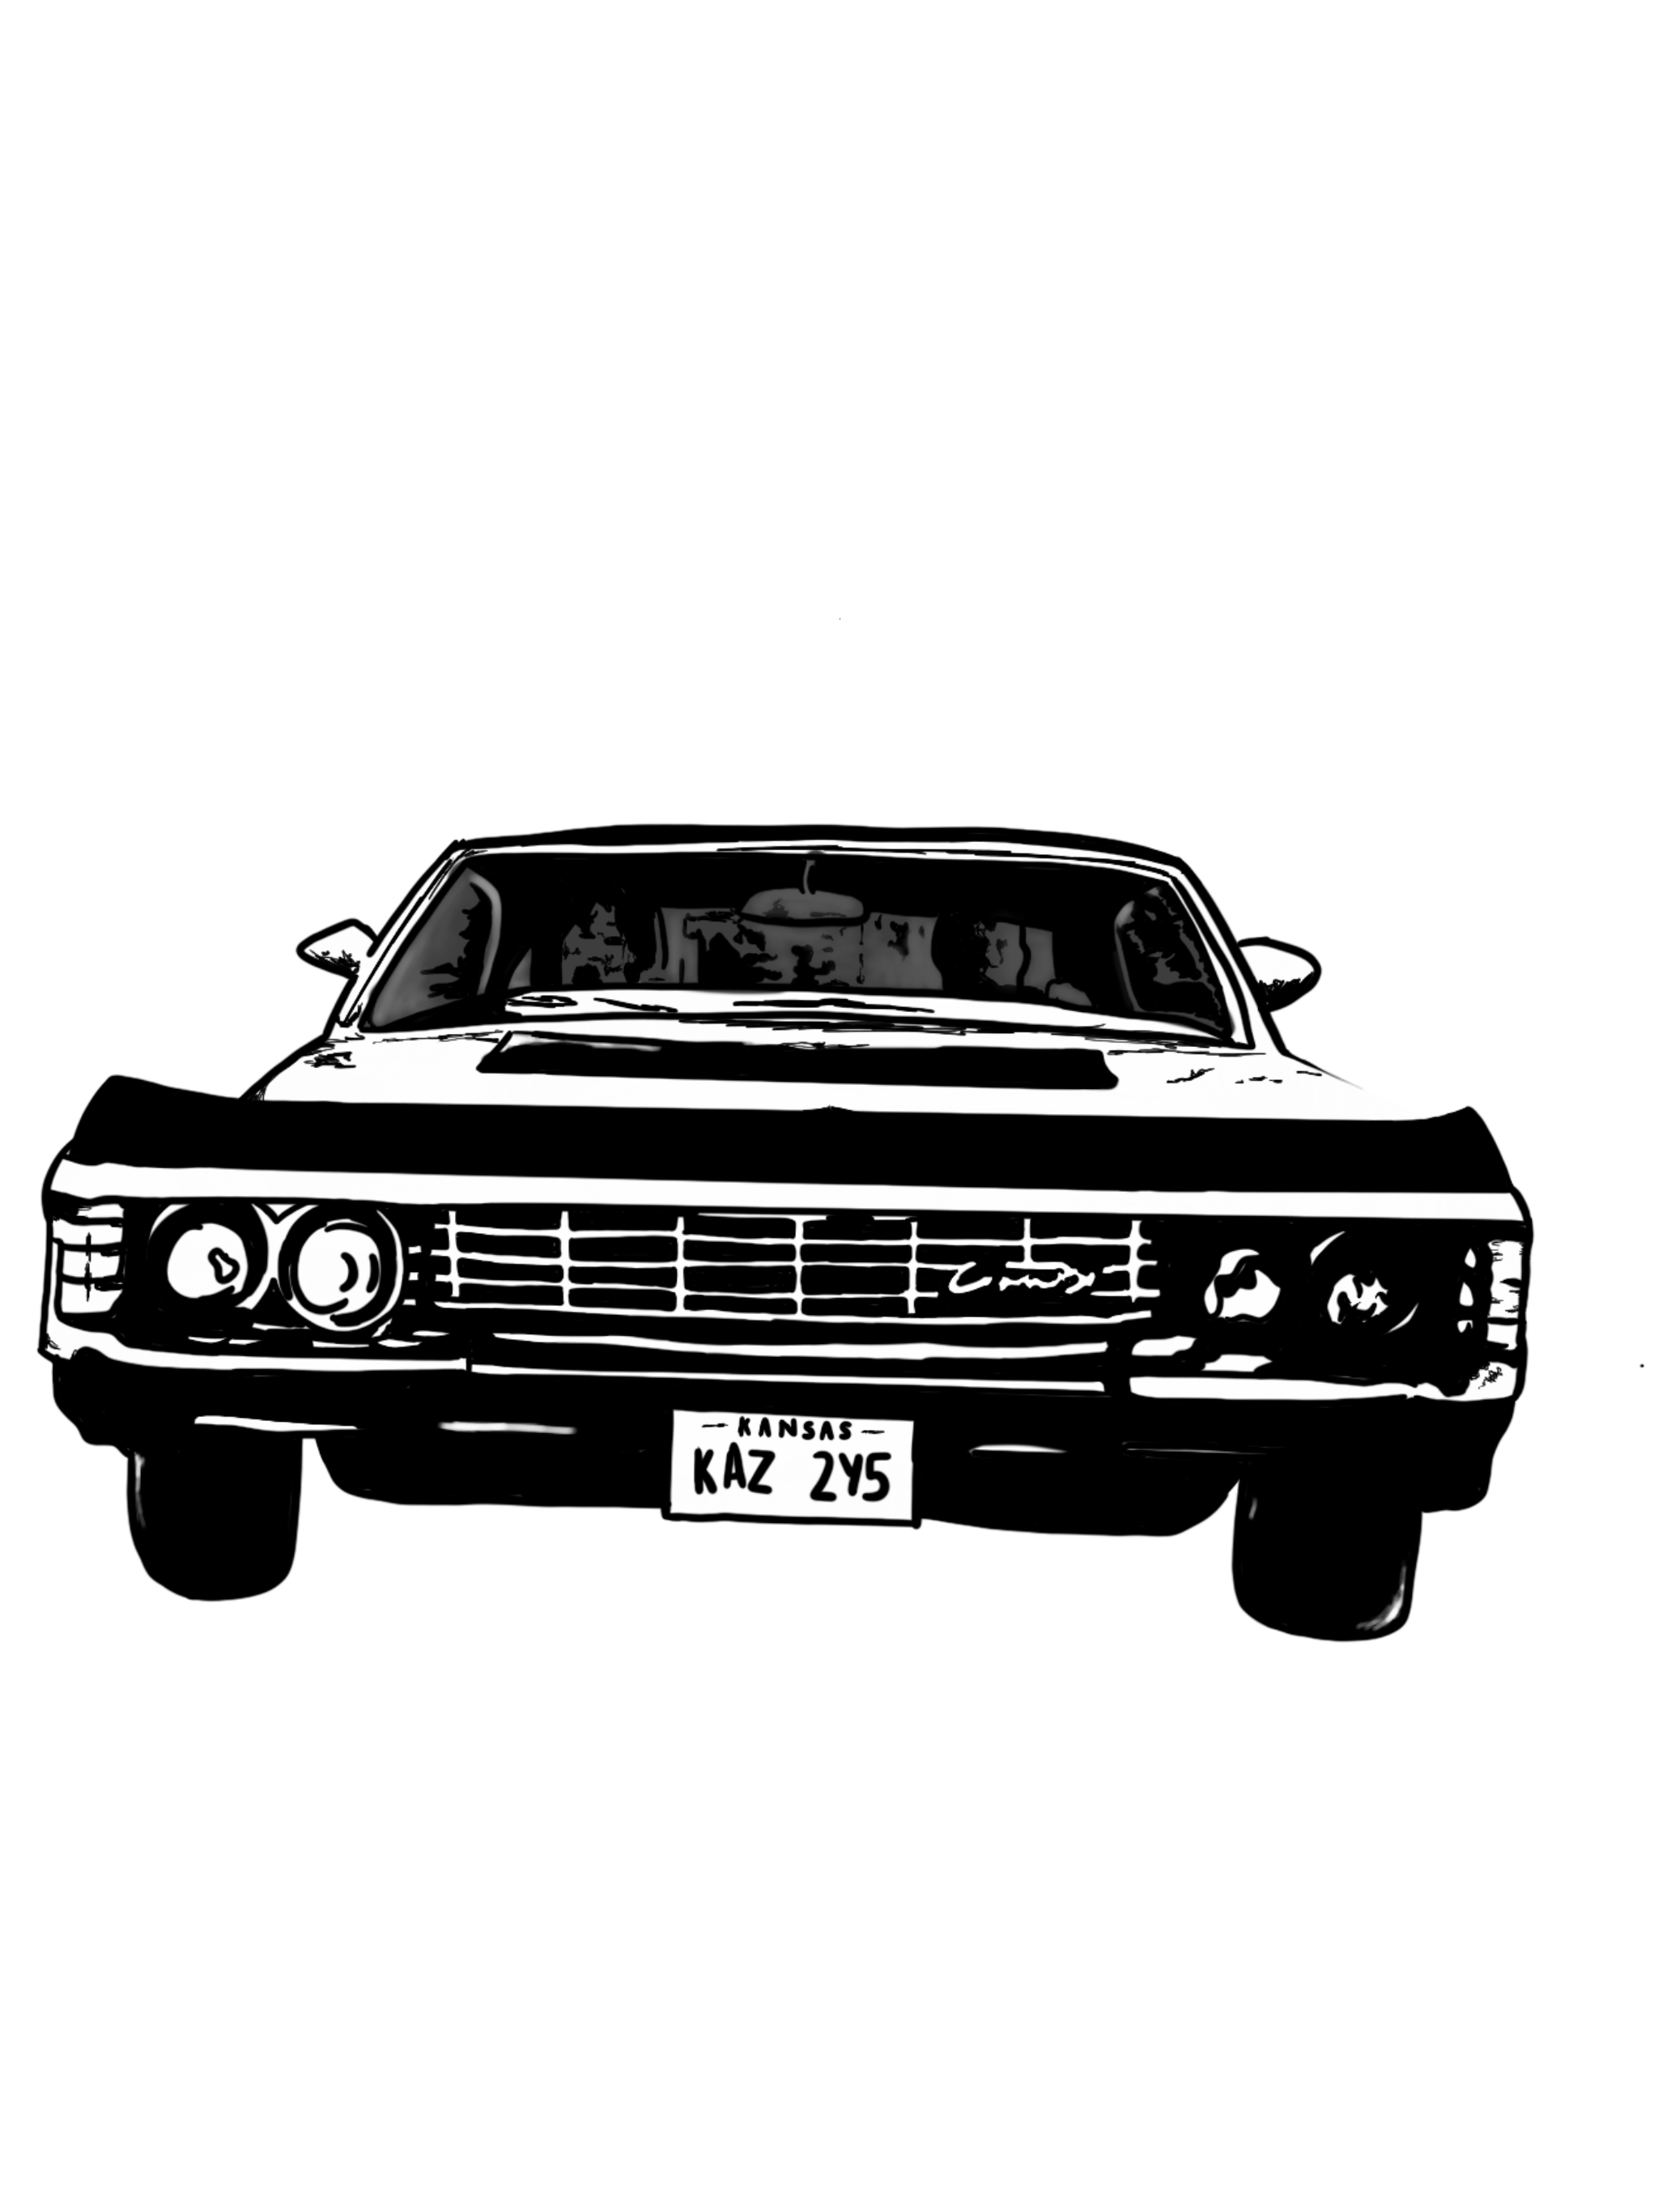 67 Chevy Impala Png No Background & Free 67 Chevy Impala No.